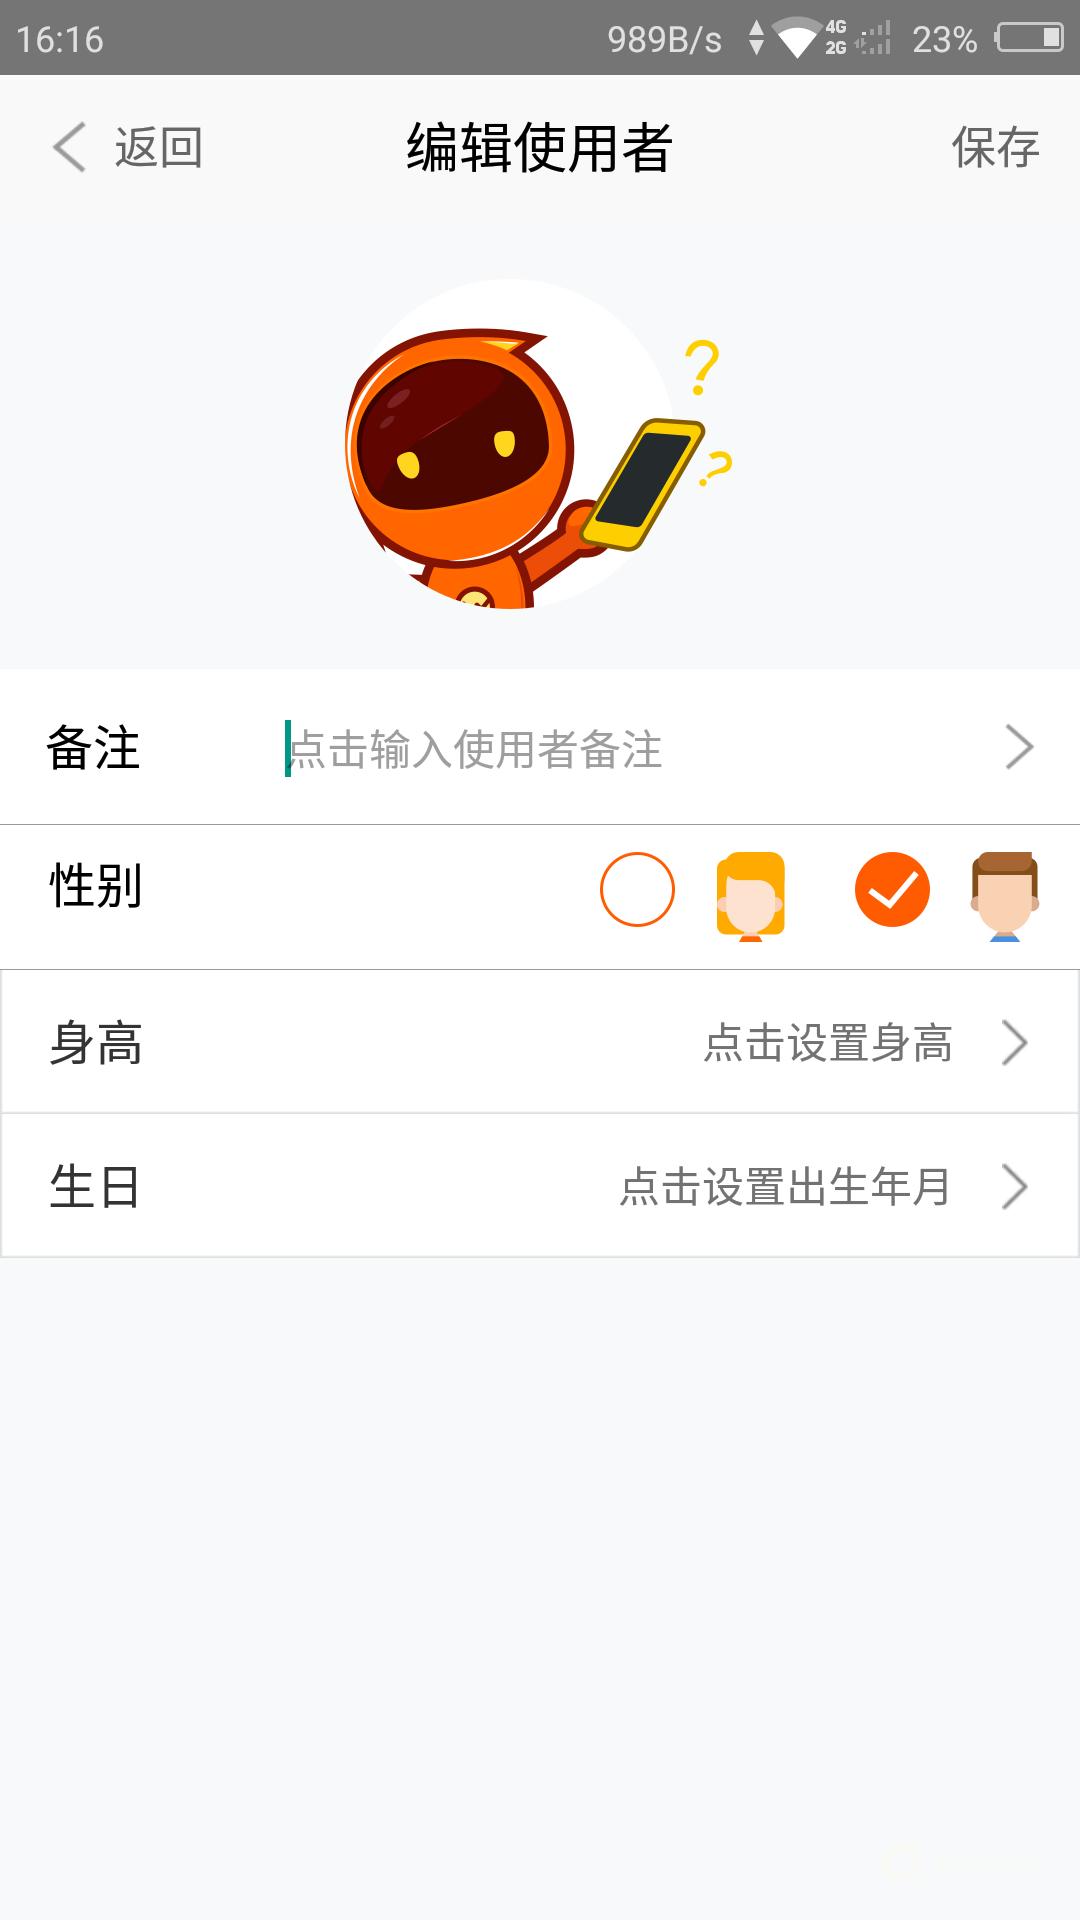 Screenshot_2018-01-31-16-16-35.png